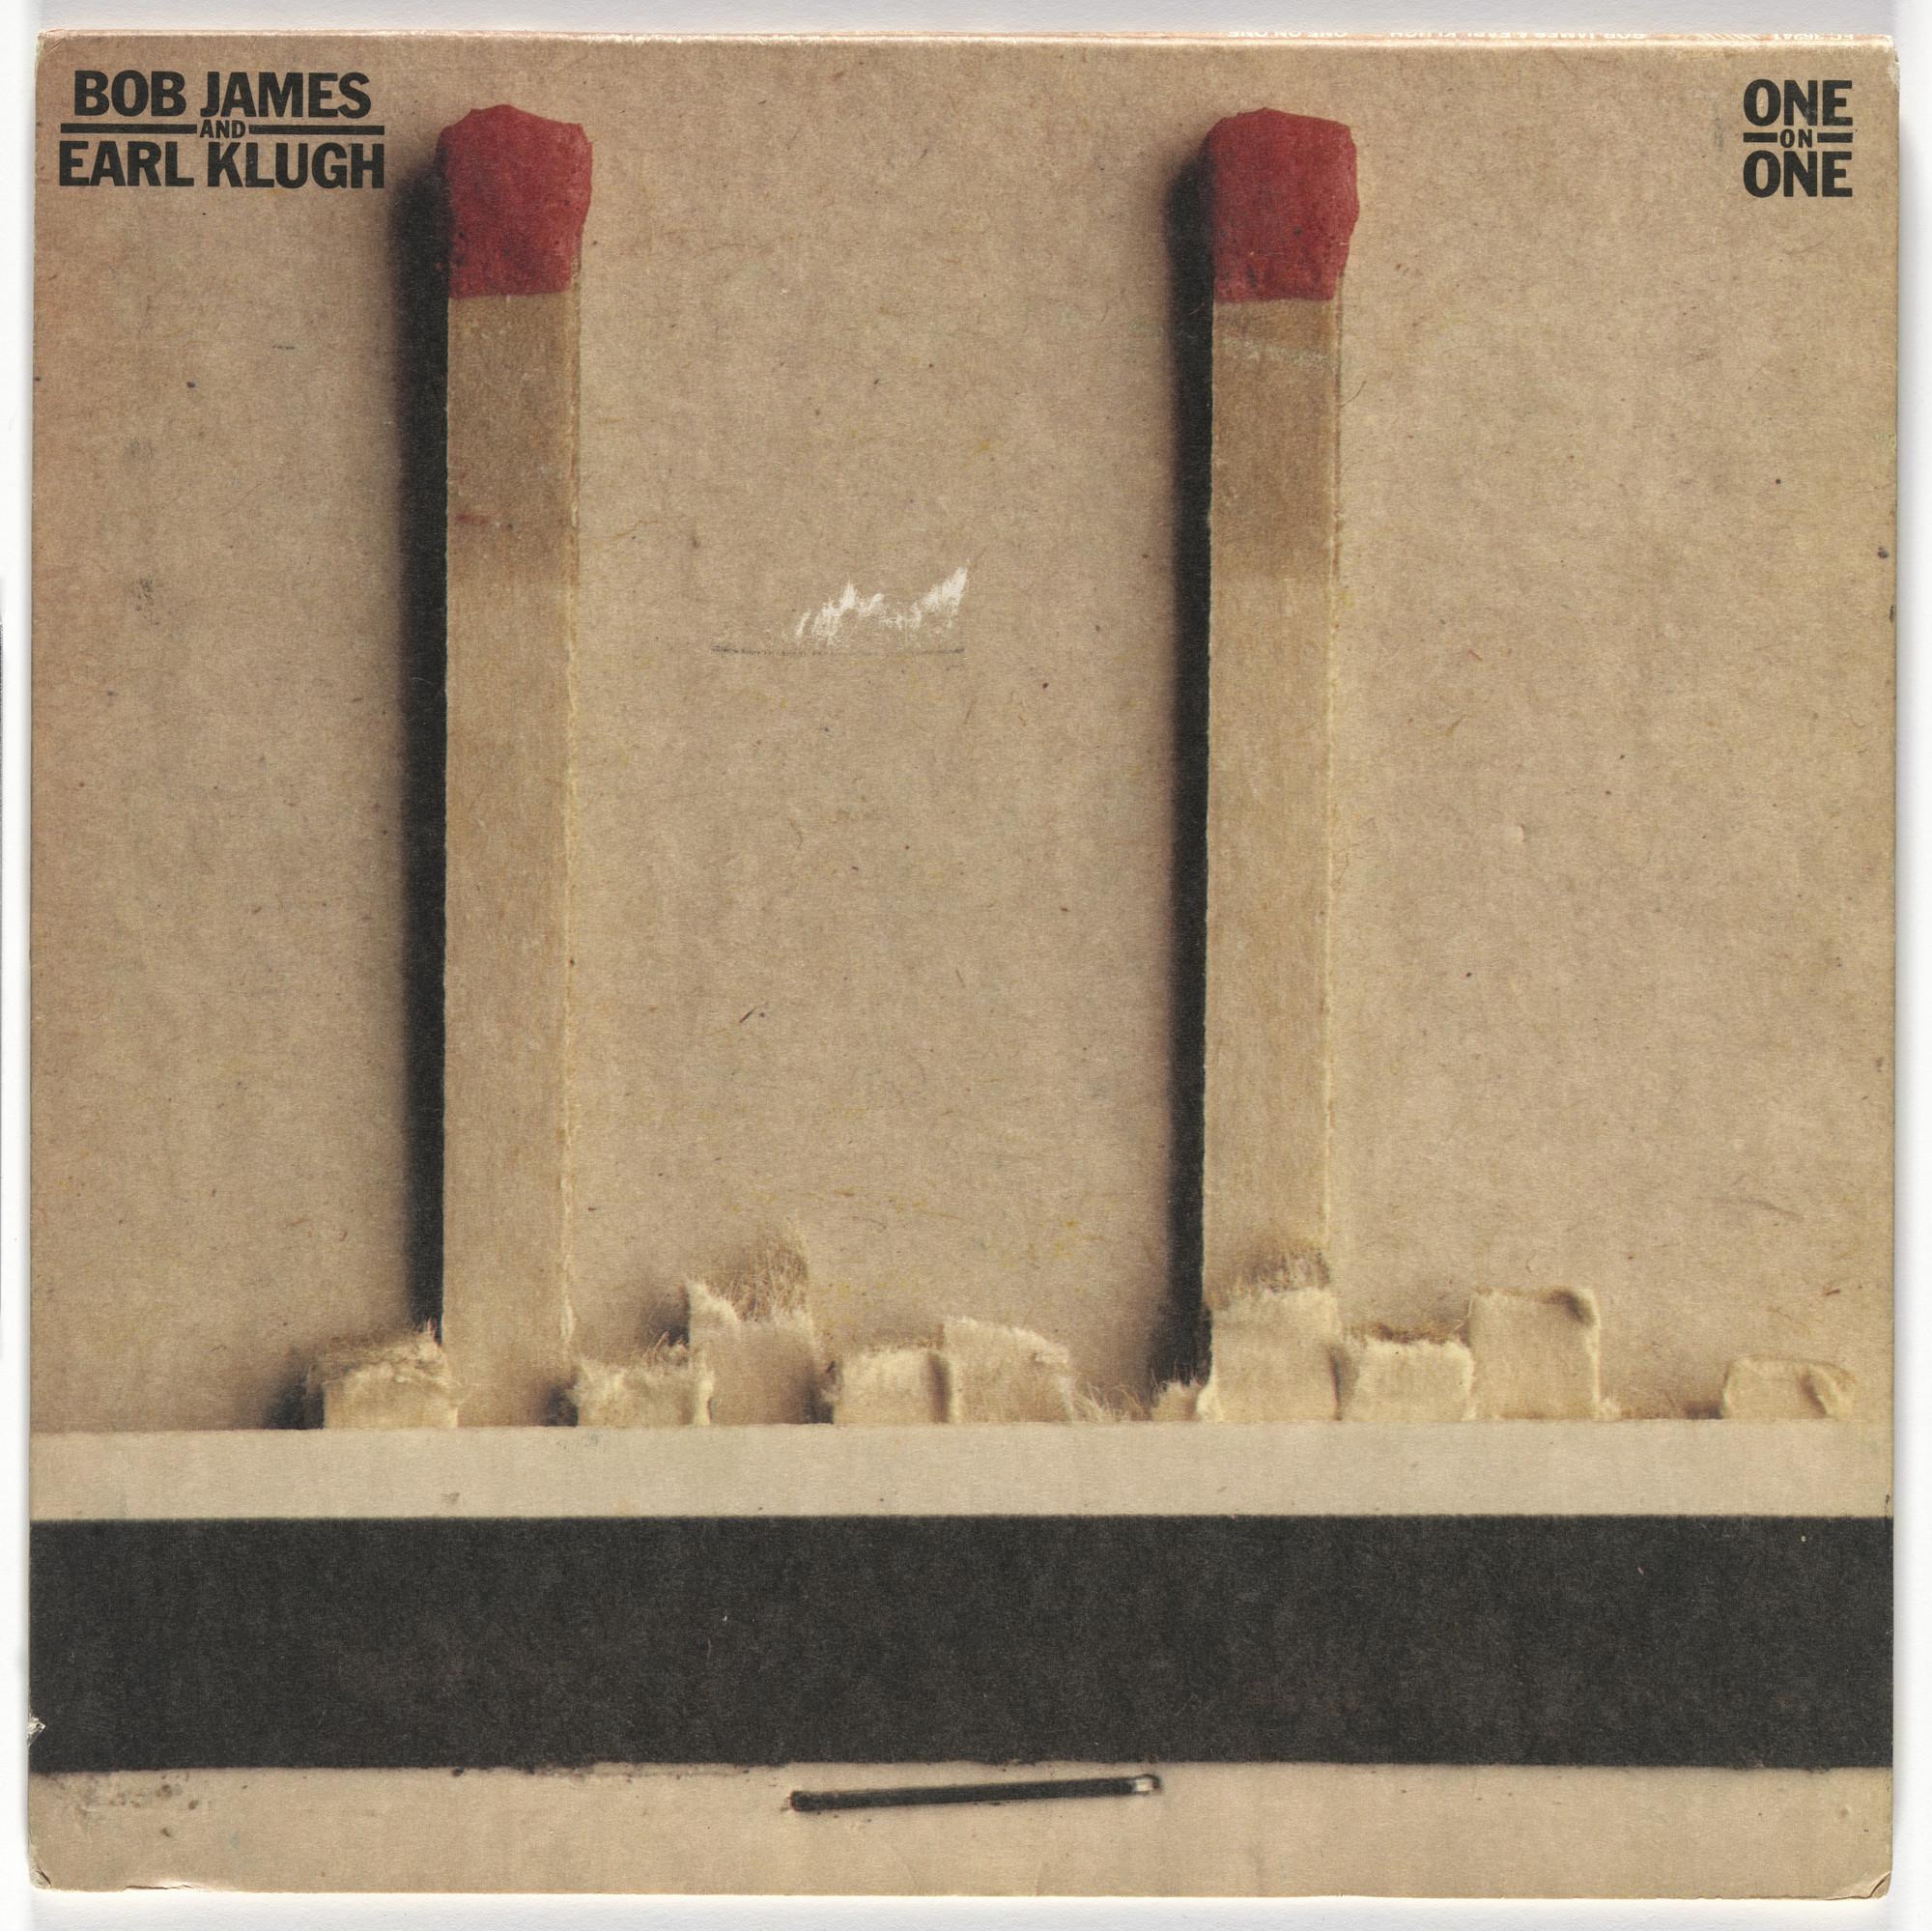 Paula Scher, Arnold Rosenberg  Album cover for Bob James and Earl